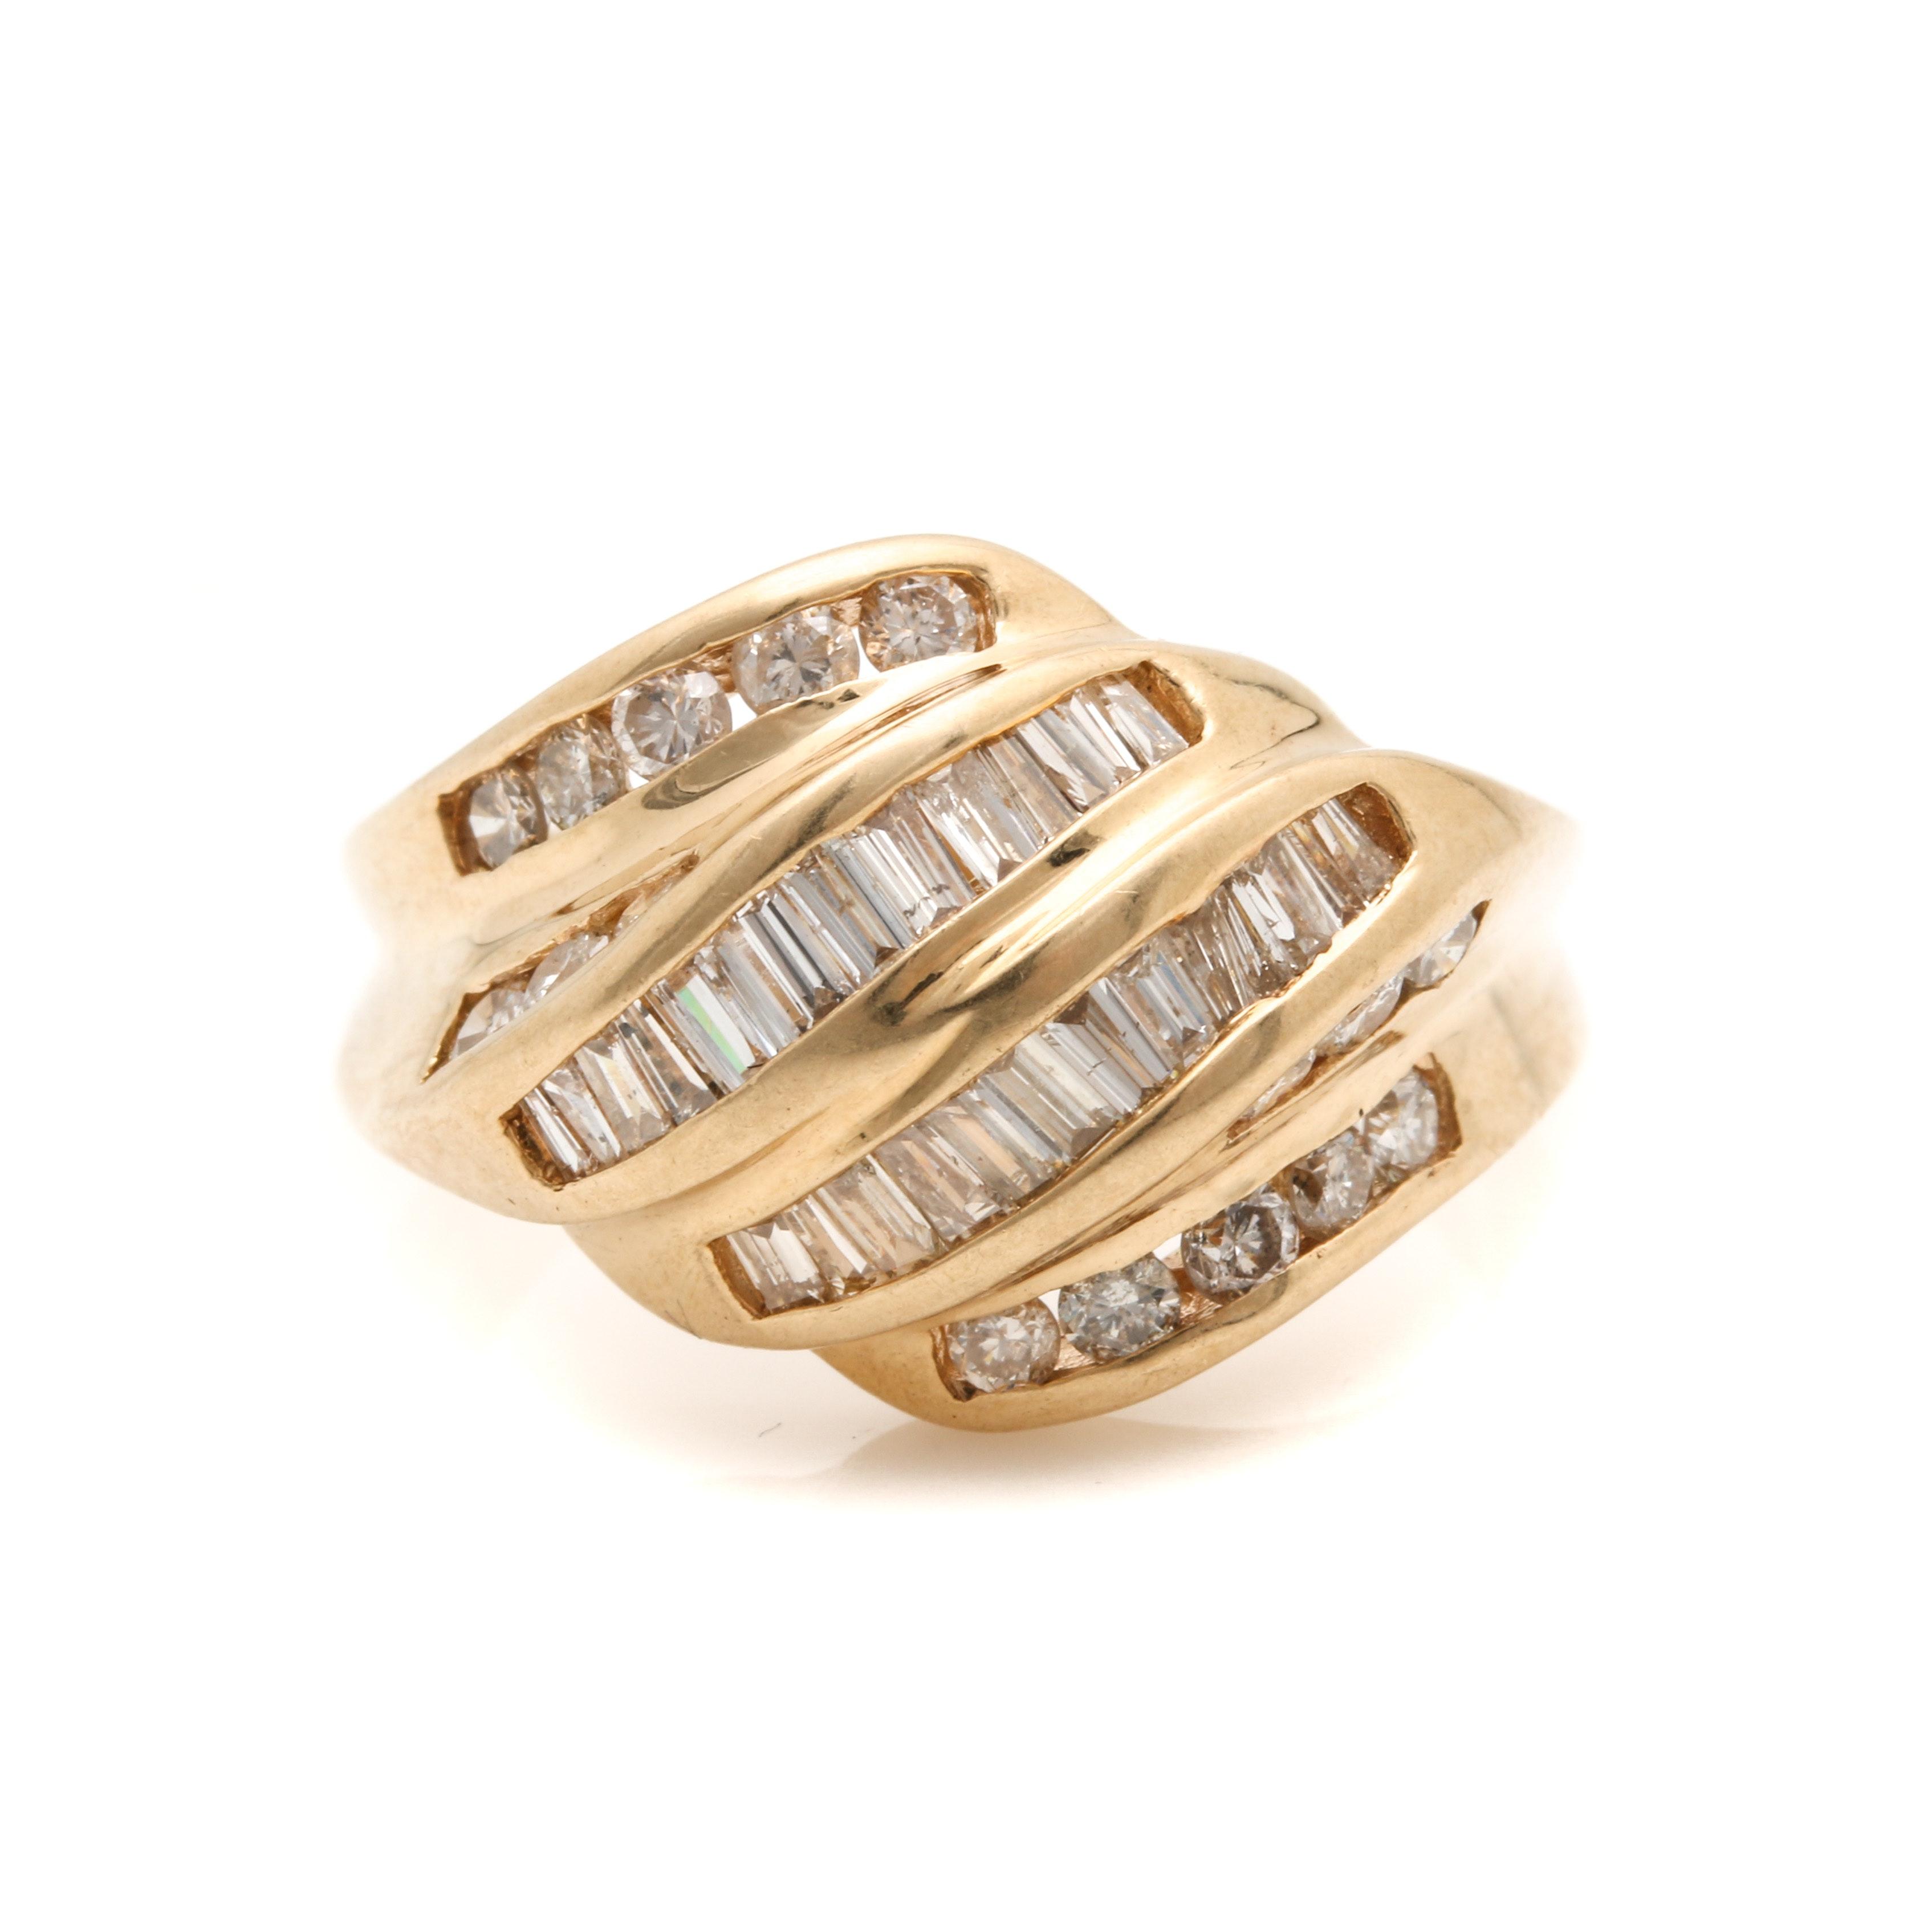 14K Yellow Gold 1.23 CTW Diamond Dome Ring